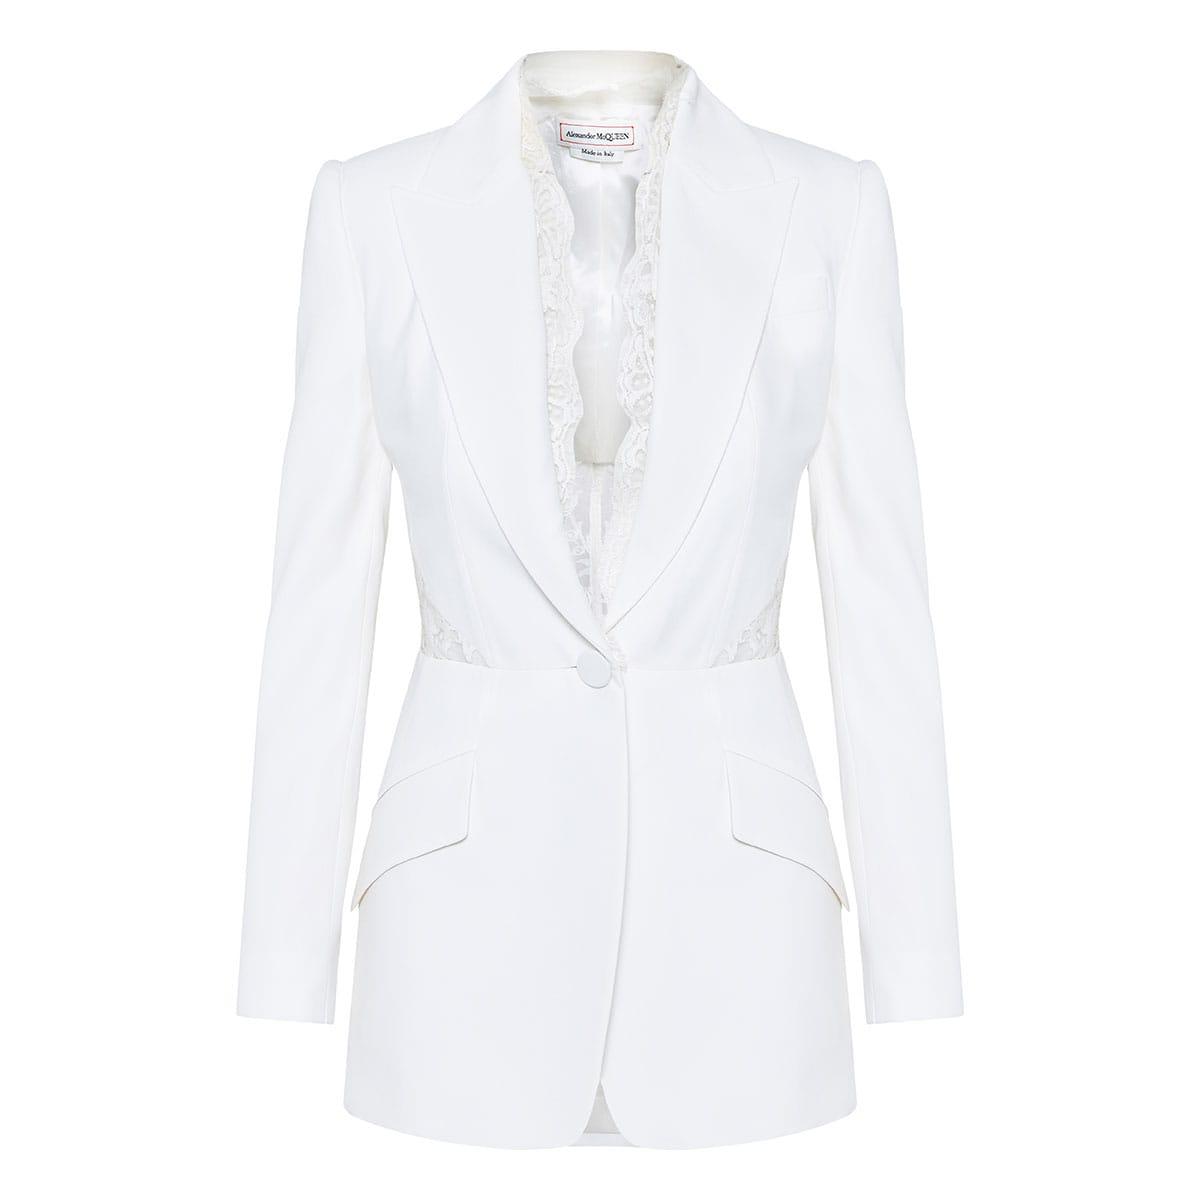 Lace-paneled blazer